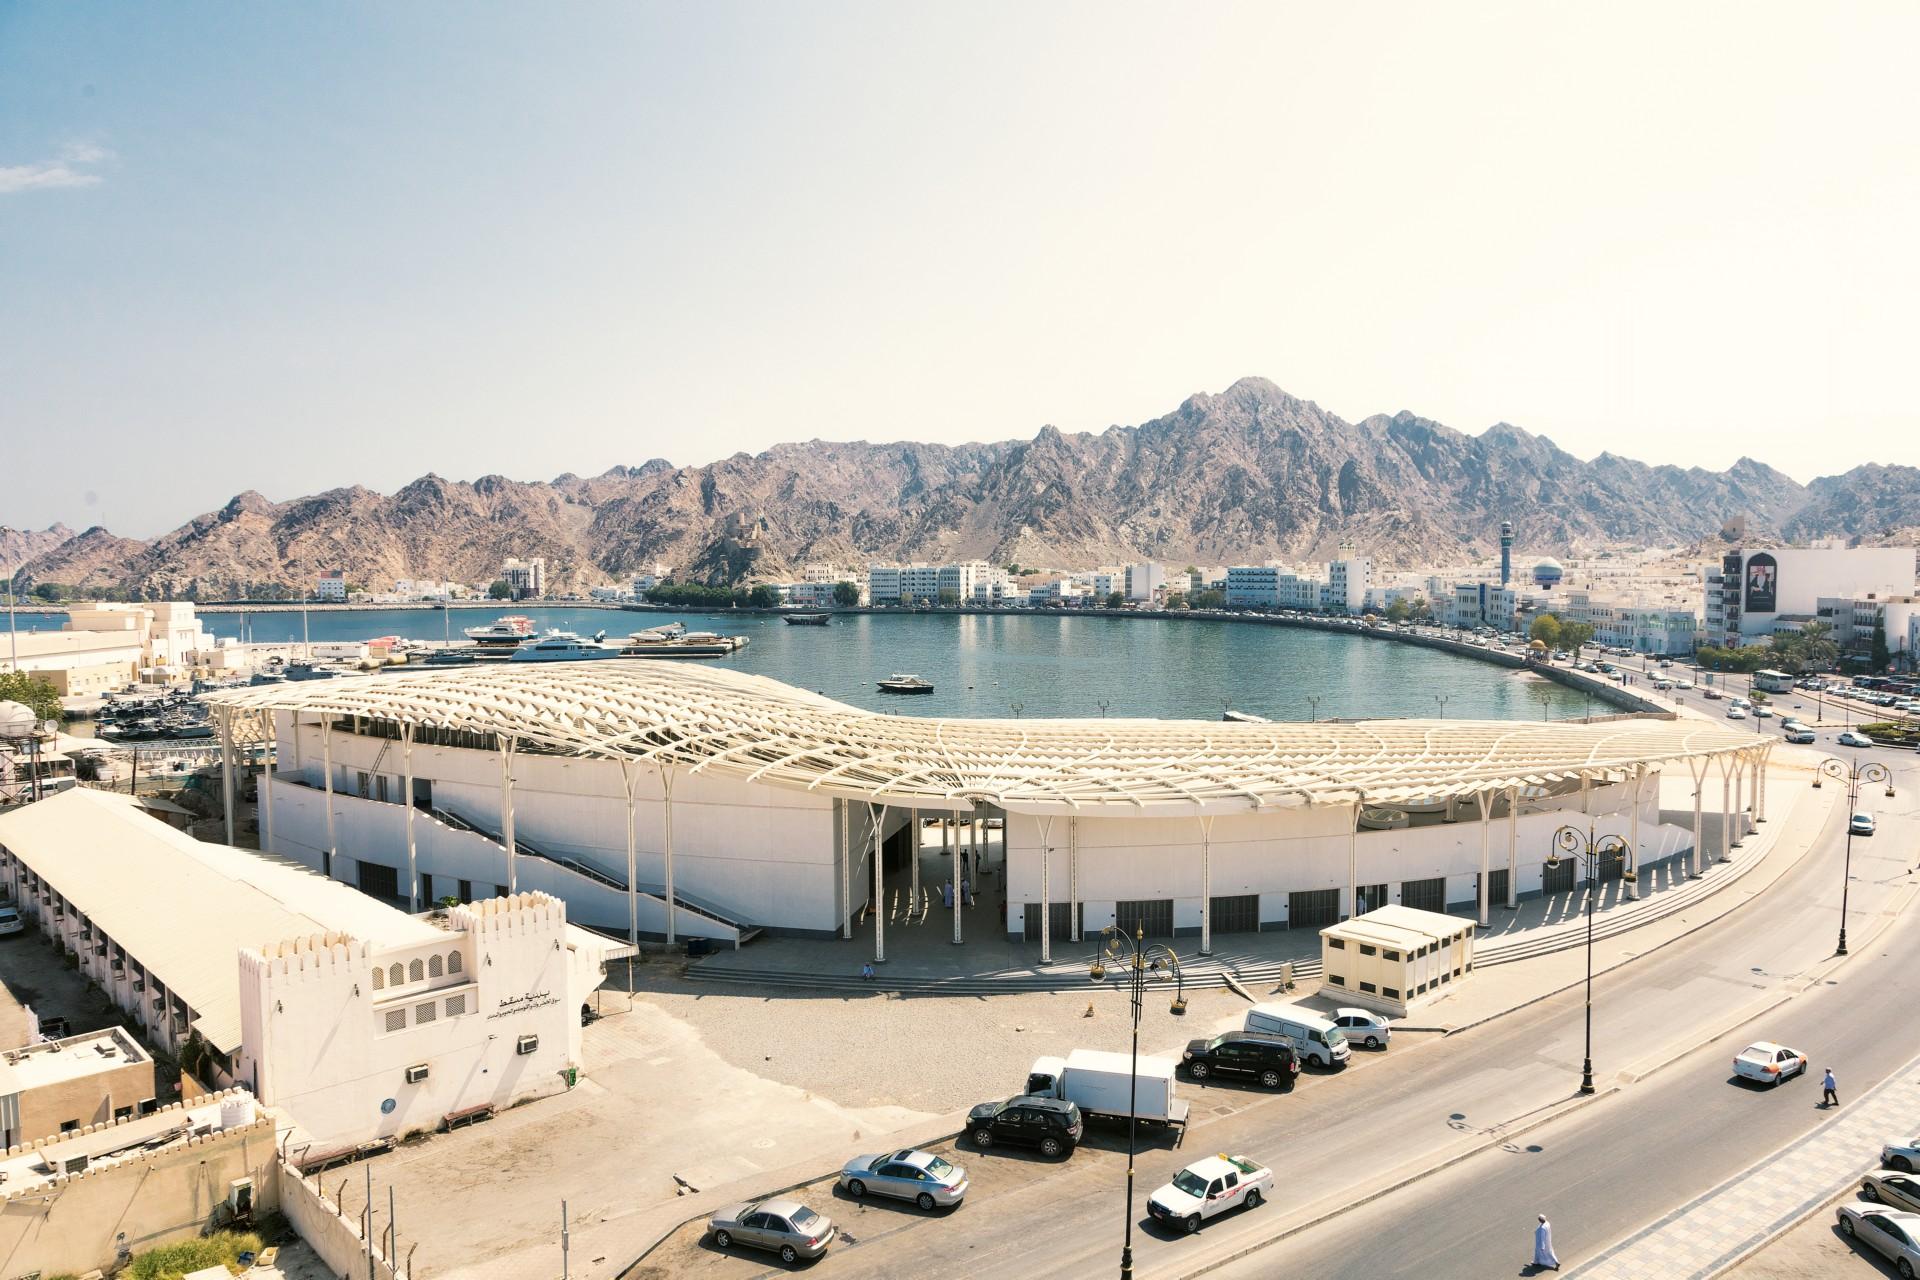 Snøhetta completes the Muttrah Fish Market - Oman